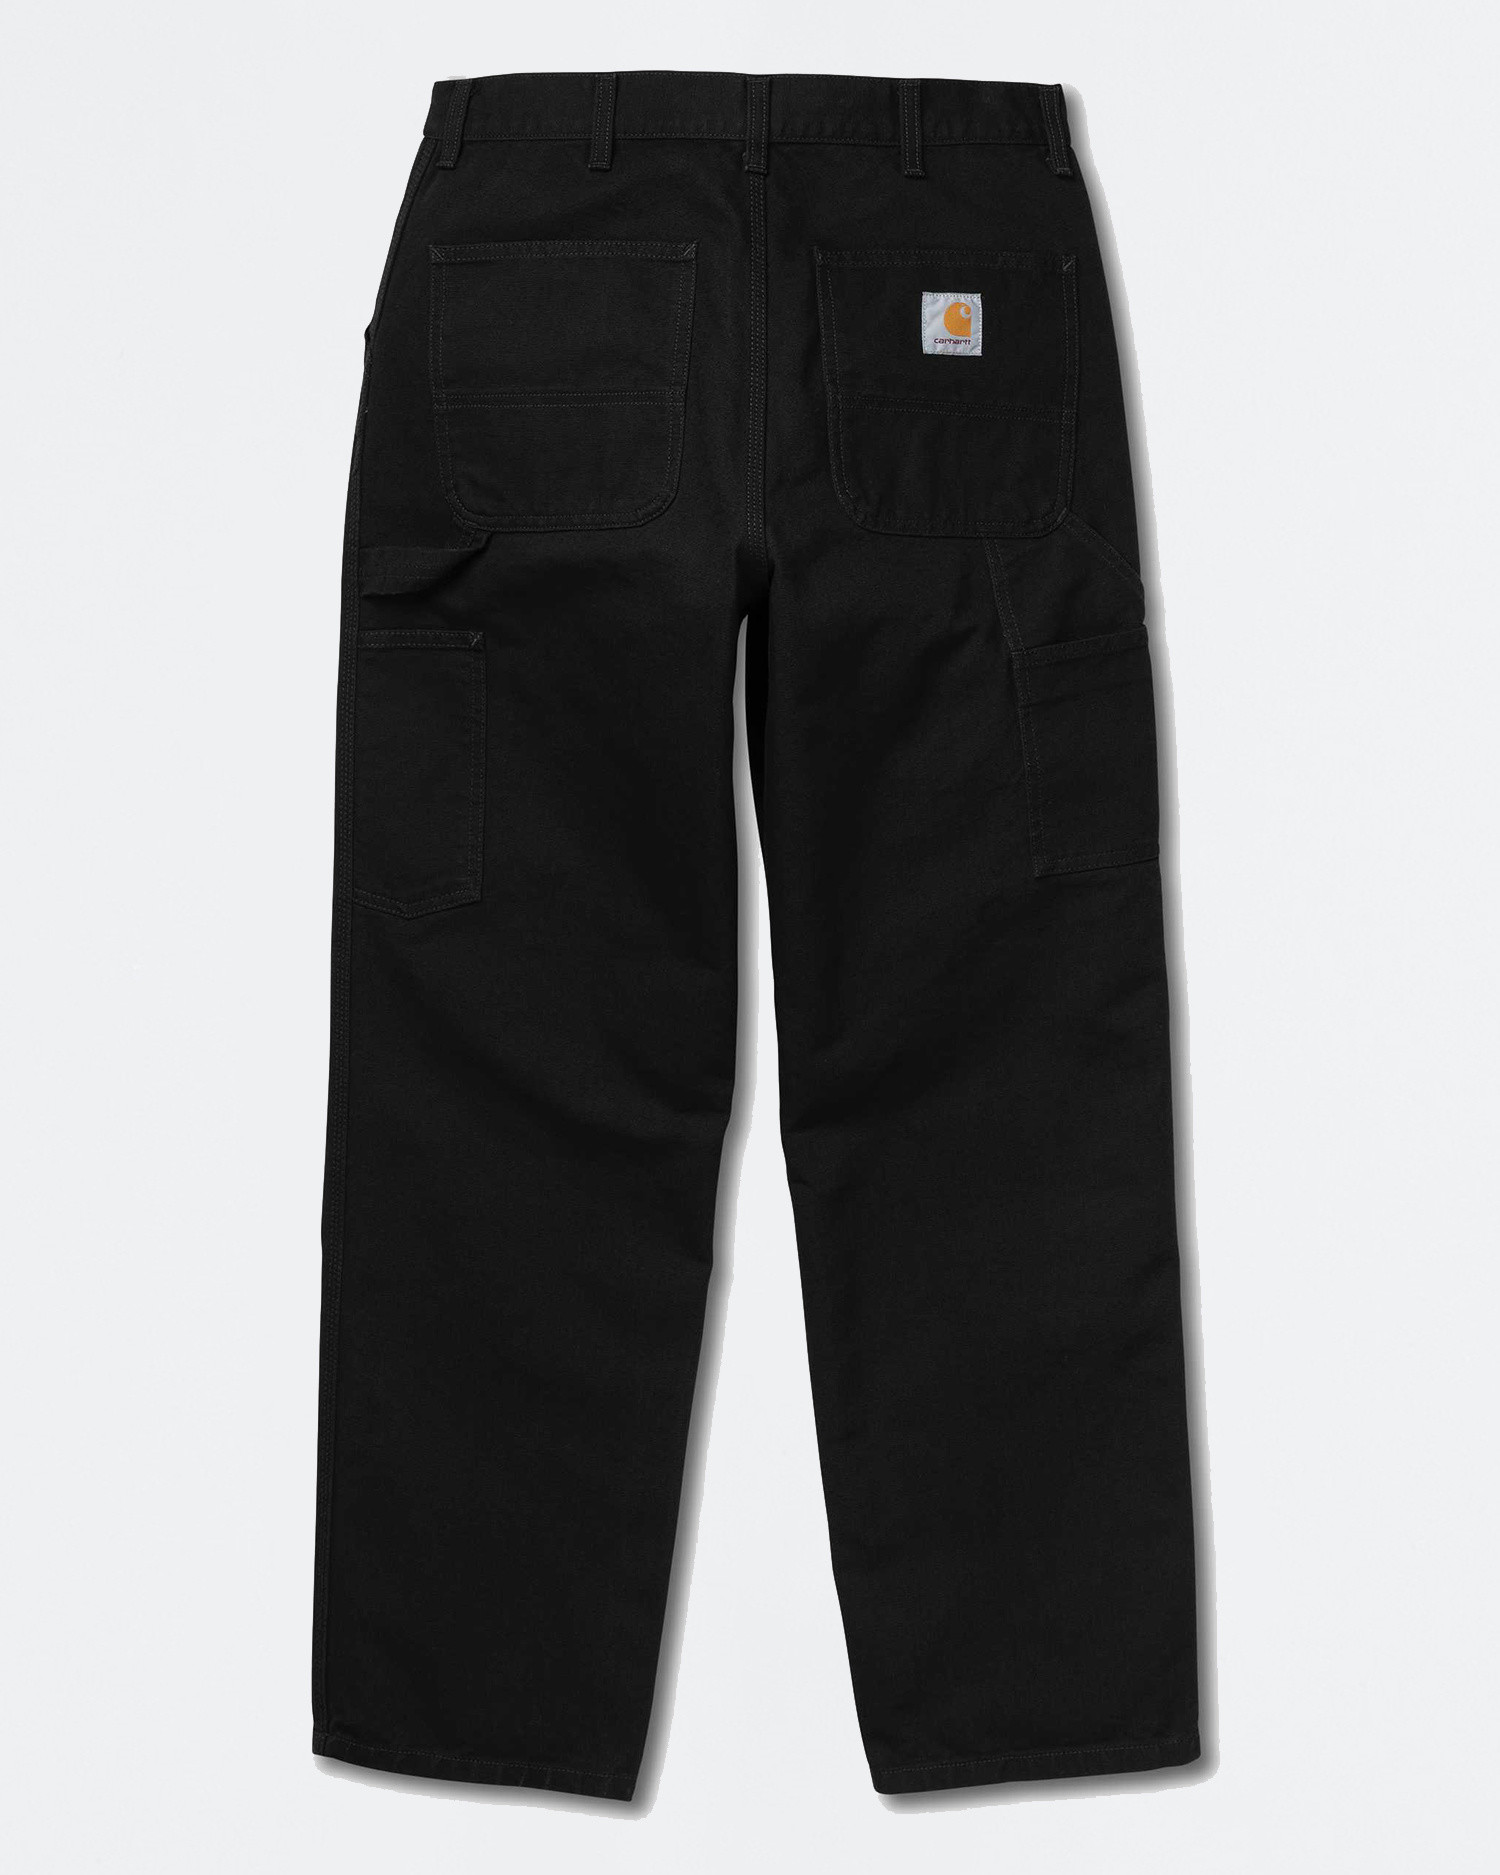 Carhartt Single Knee Pants Organic Cotton Black Rinsed